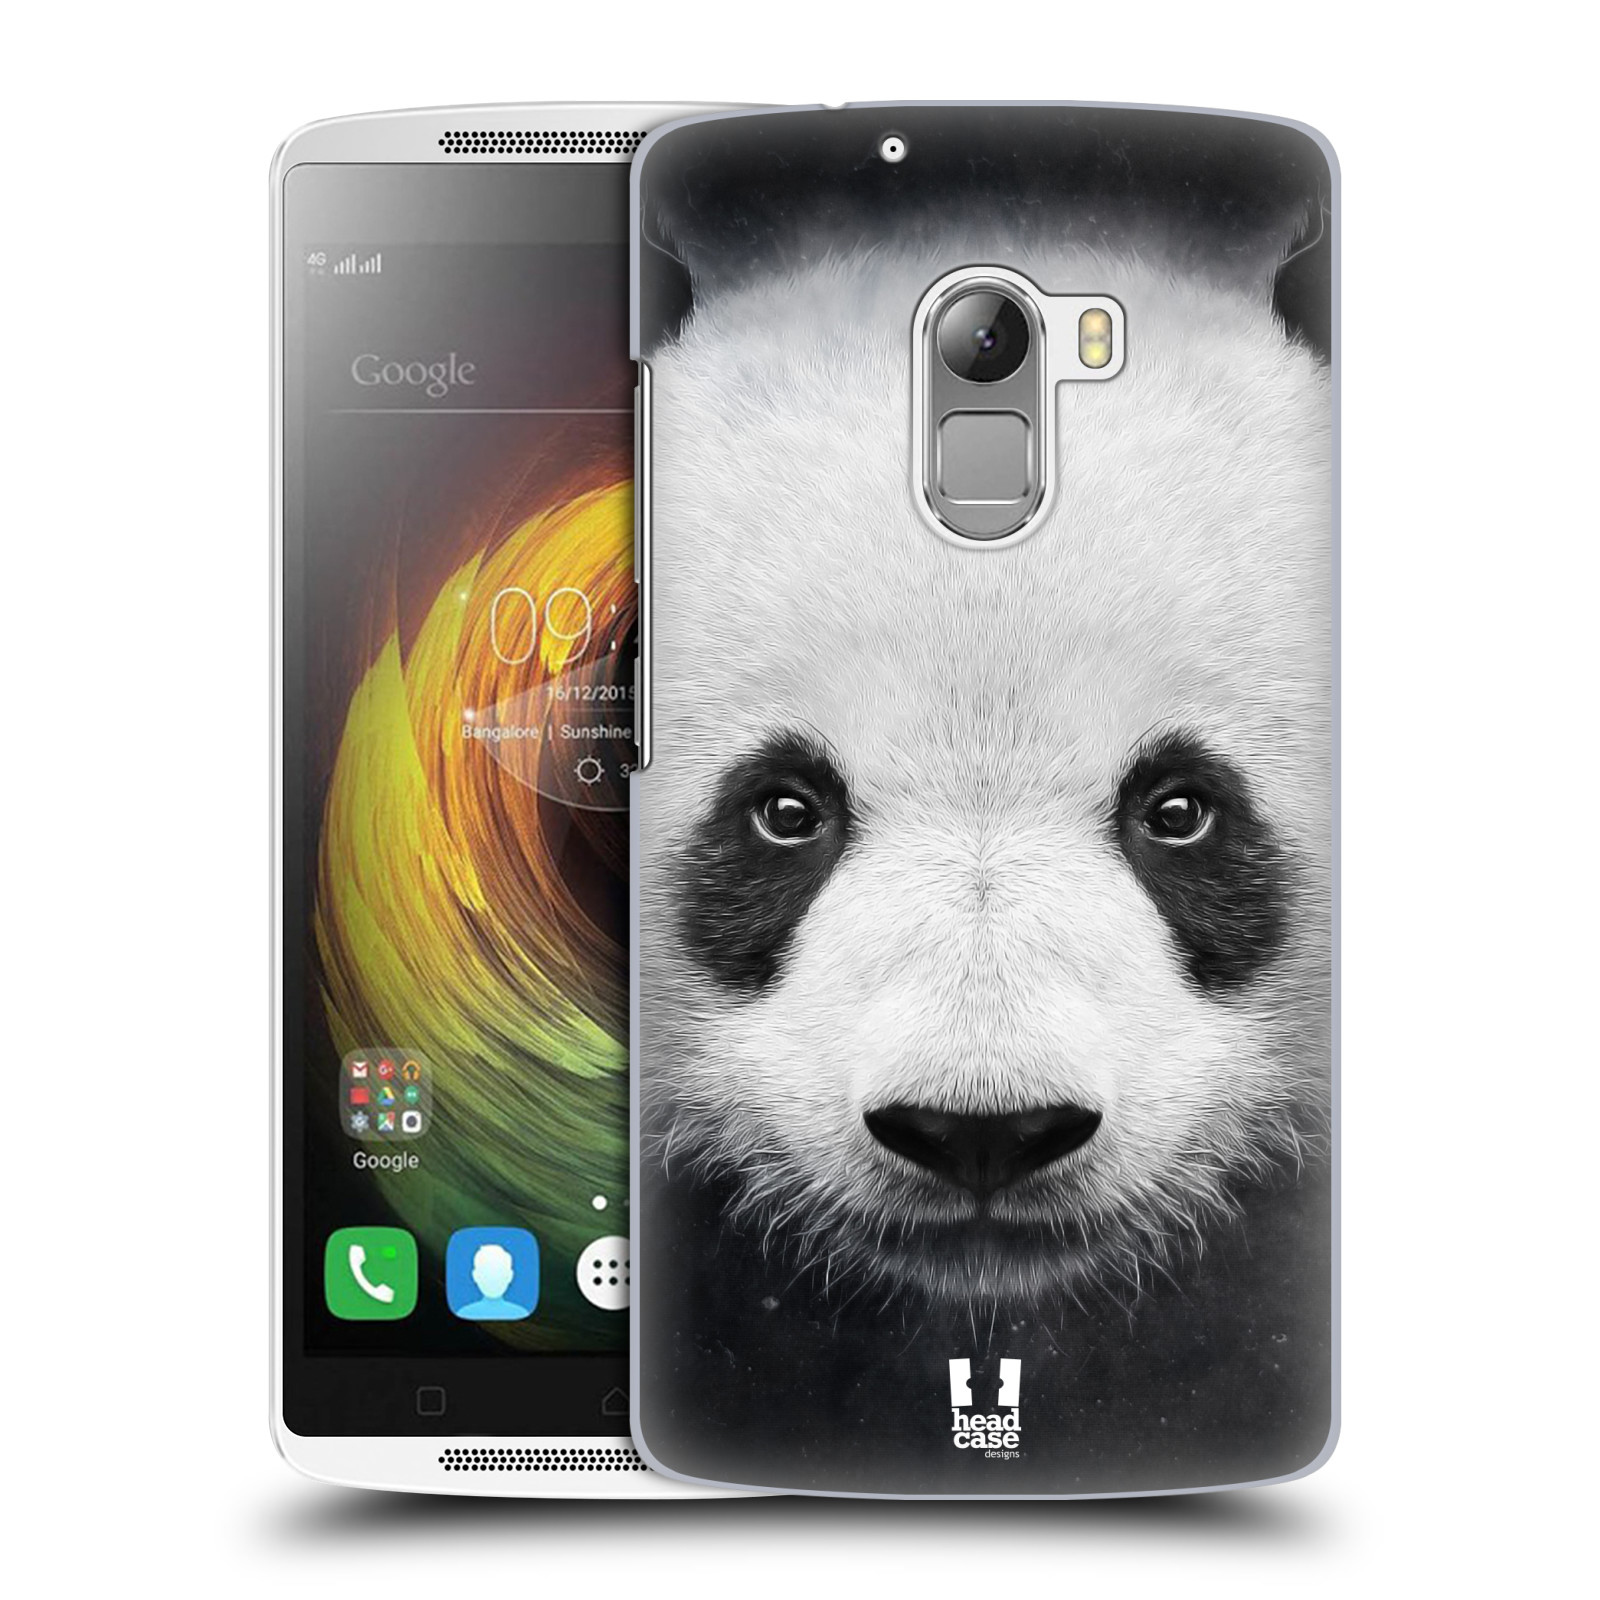 HEAD CASE pevný plastový obal na mobil LENOVO A7010 / A7010 DUAL / K4 Note / Vibe X3 lite vzor Zvířecí tváře medvěd panda